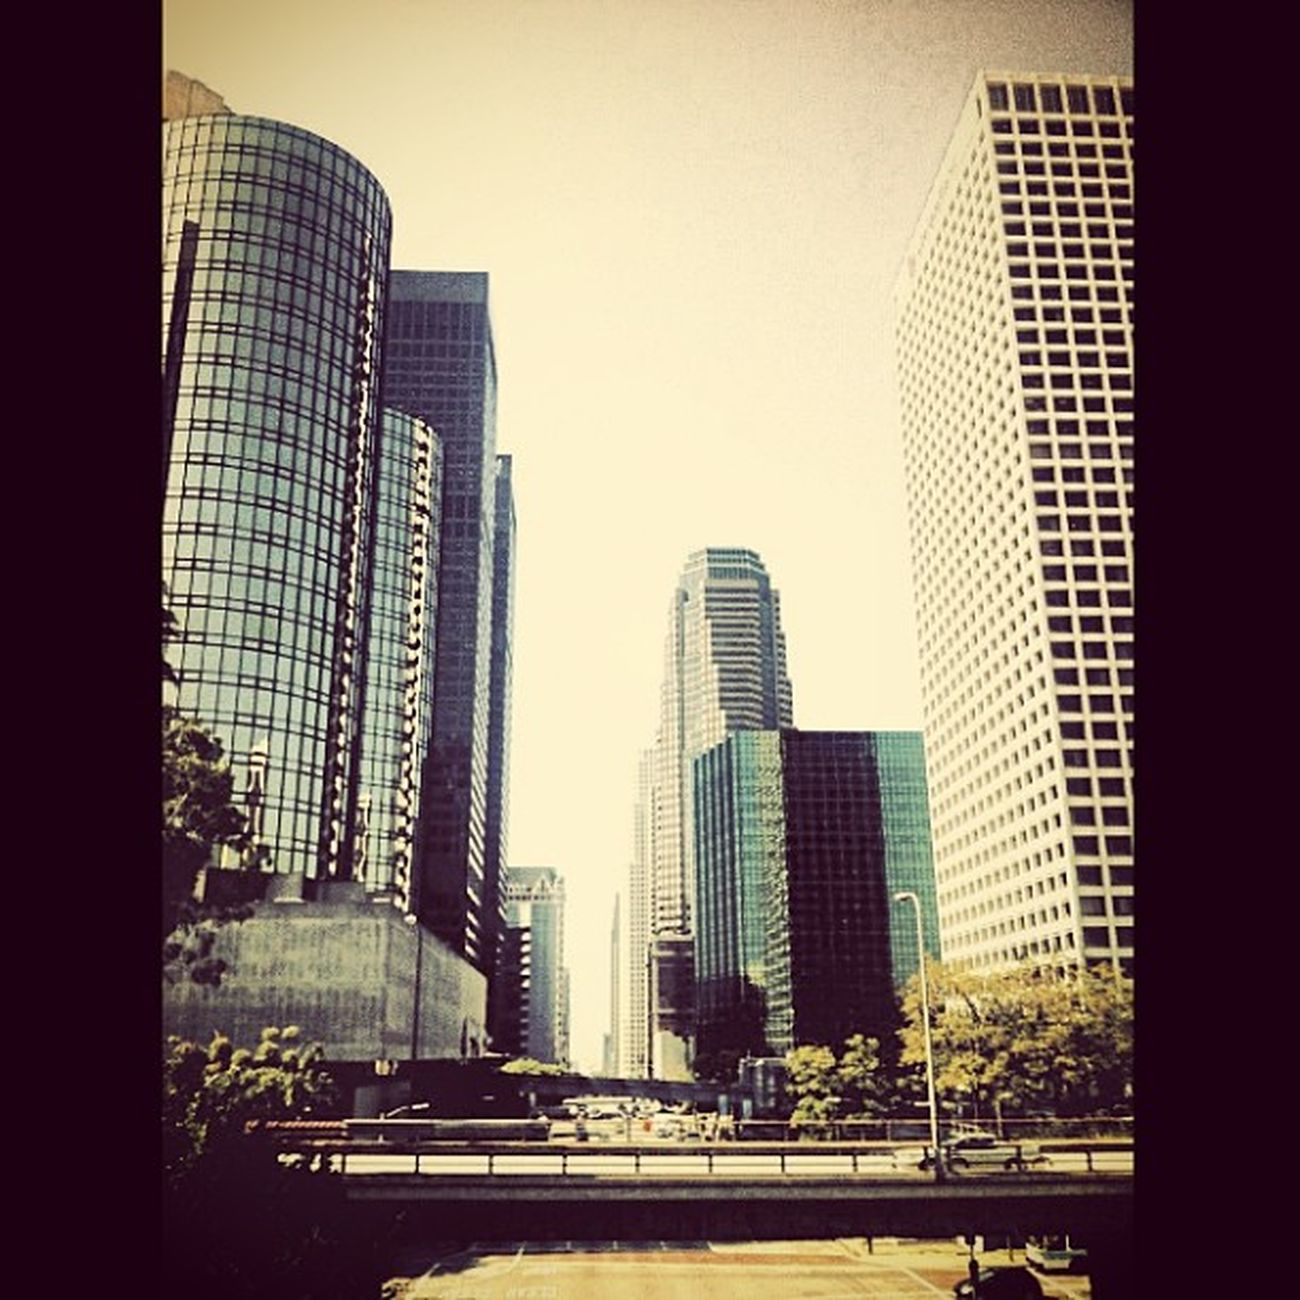 Downtown Los Angeles! YR&F™ www.YrfLifestyle.com DowntownLA Losangeles La Santamonica Beverlyhills Belair Westla Hollywood Longbeach Culvercity 101 Luxury Lifestyle Yrflifestyle Staplescenter